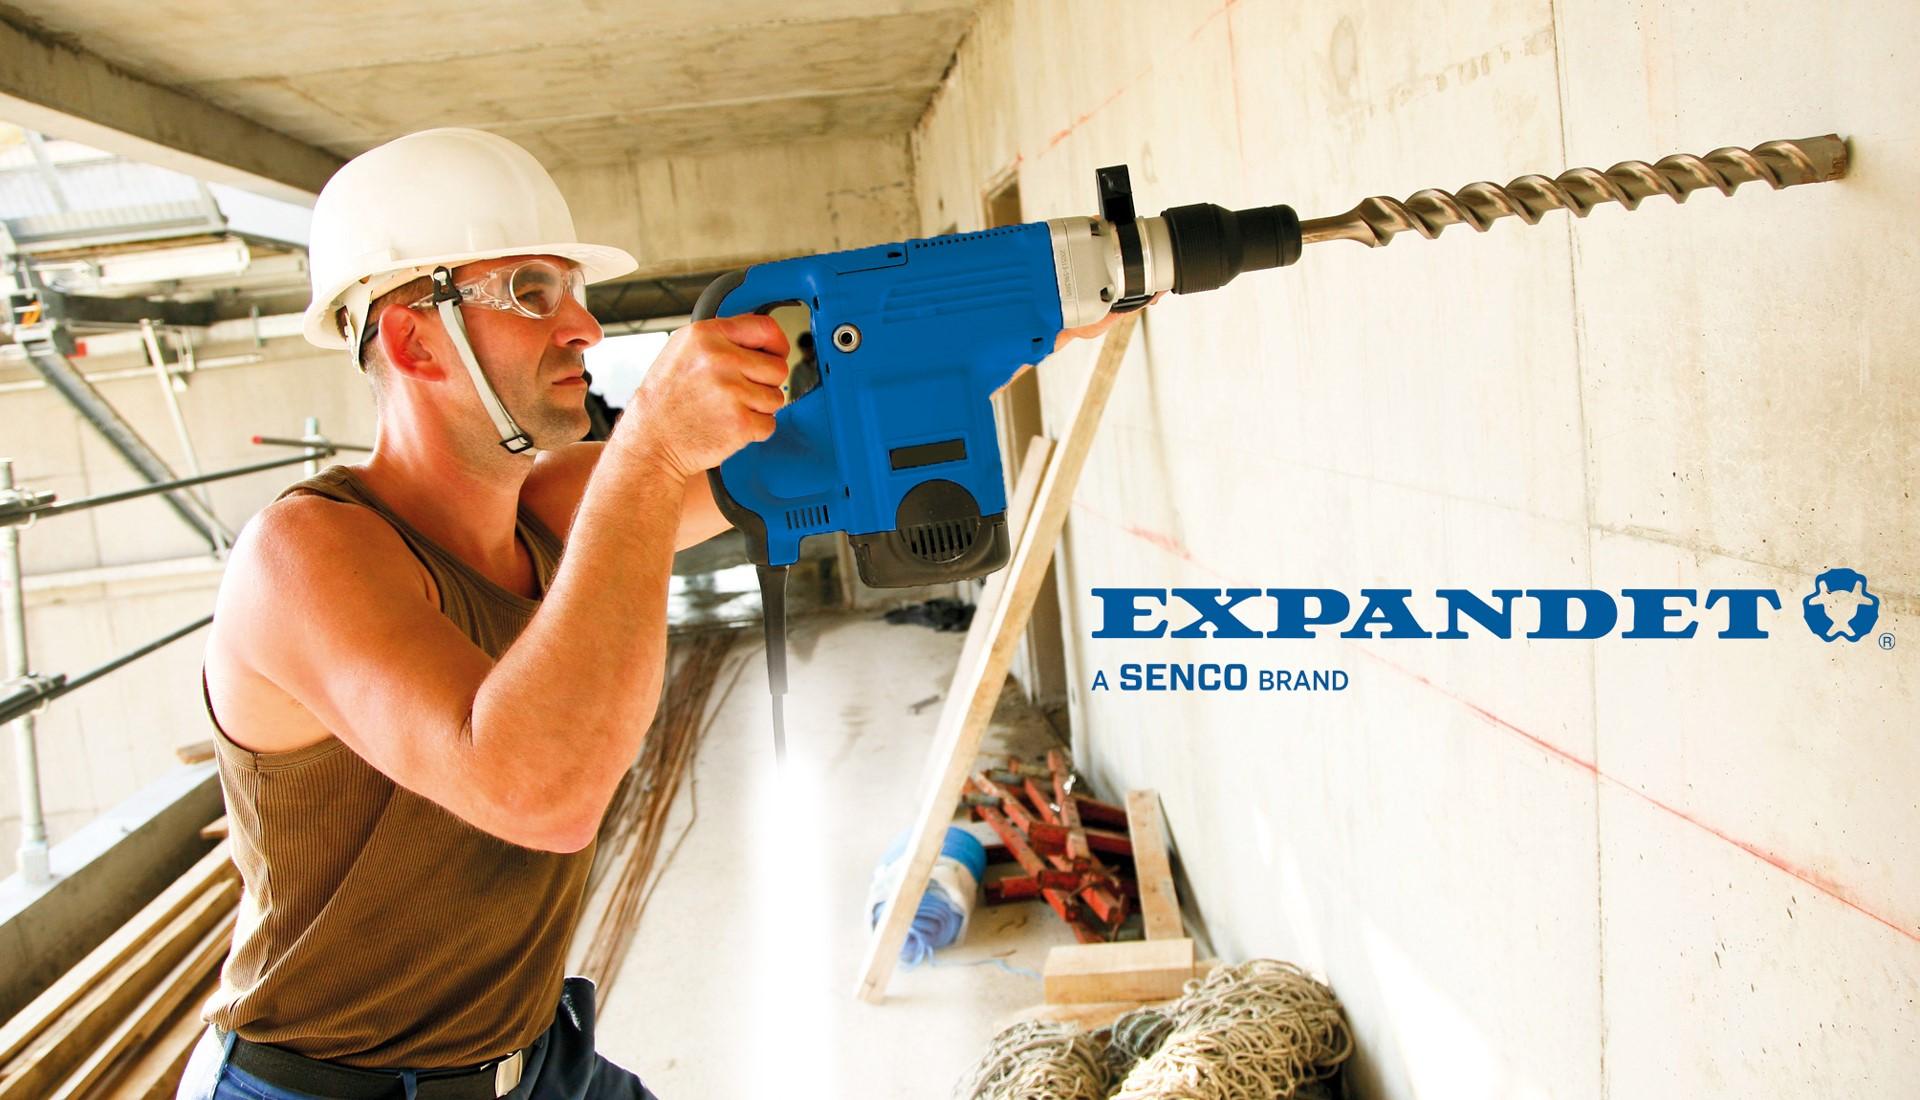 expandet-senco